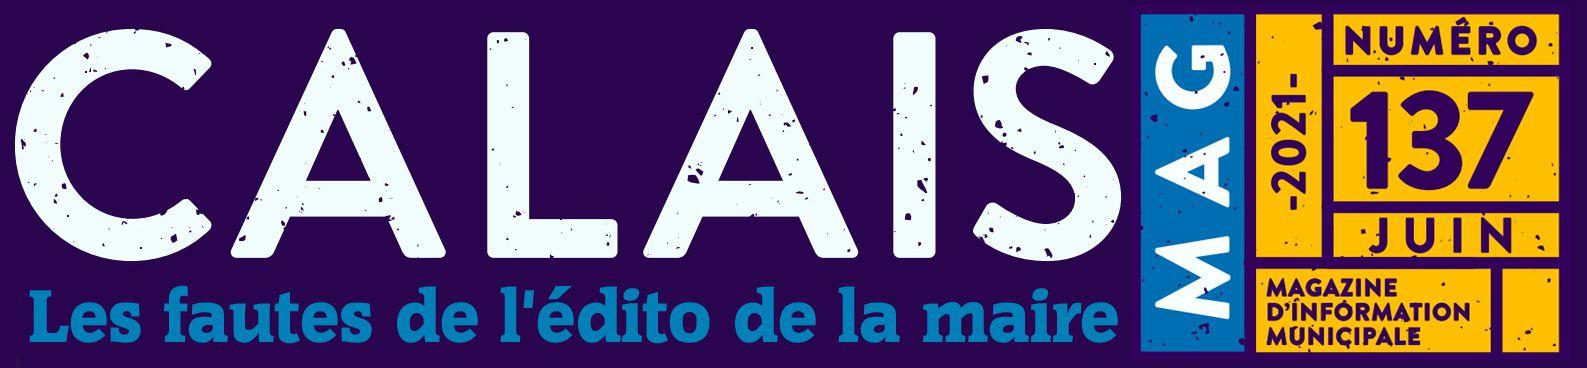 "Les fautes de l'édito du ""Calais Mag"" n° 137 (juin 2021)"